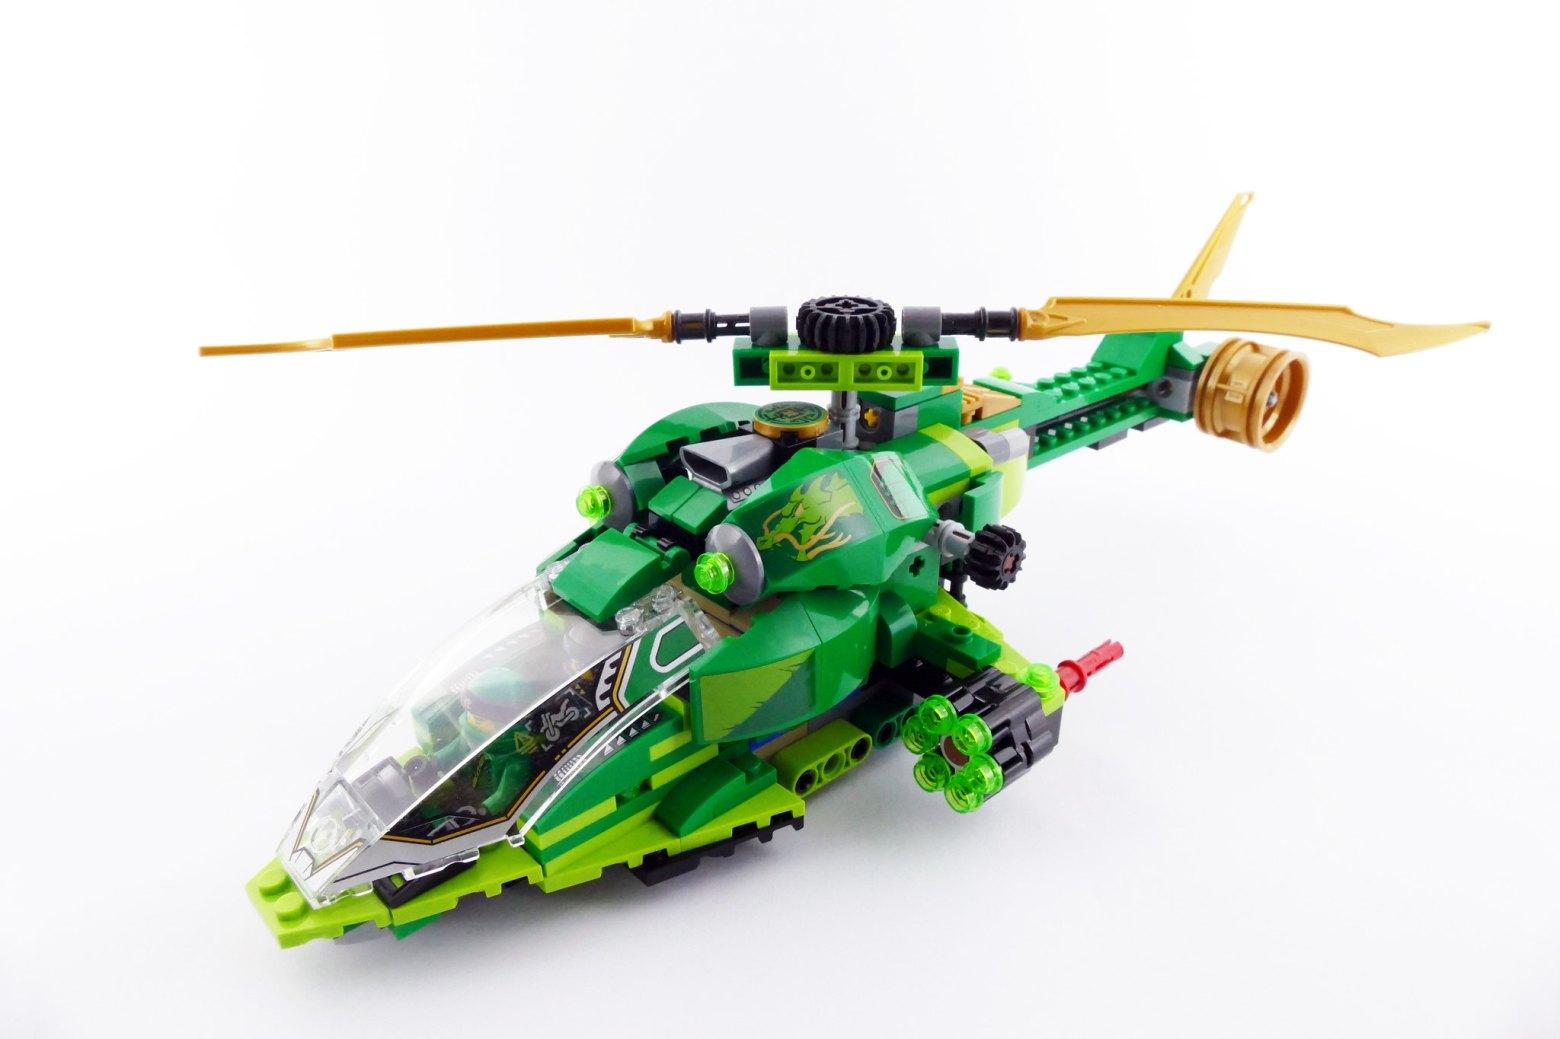 Geckopter & X-Trike LEGO Ninjago 70641 Alternate MOC